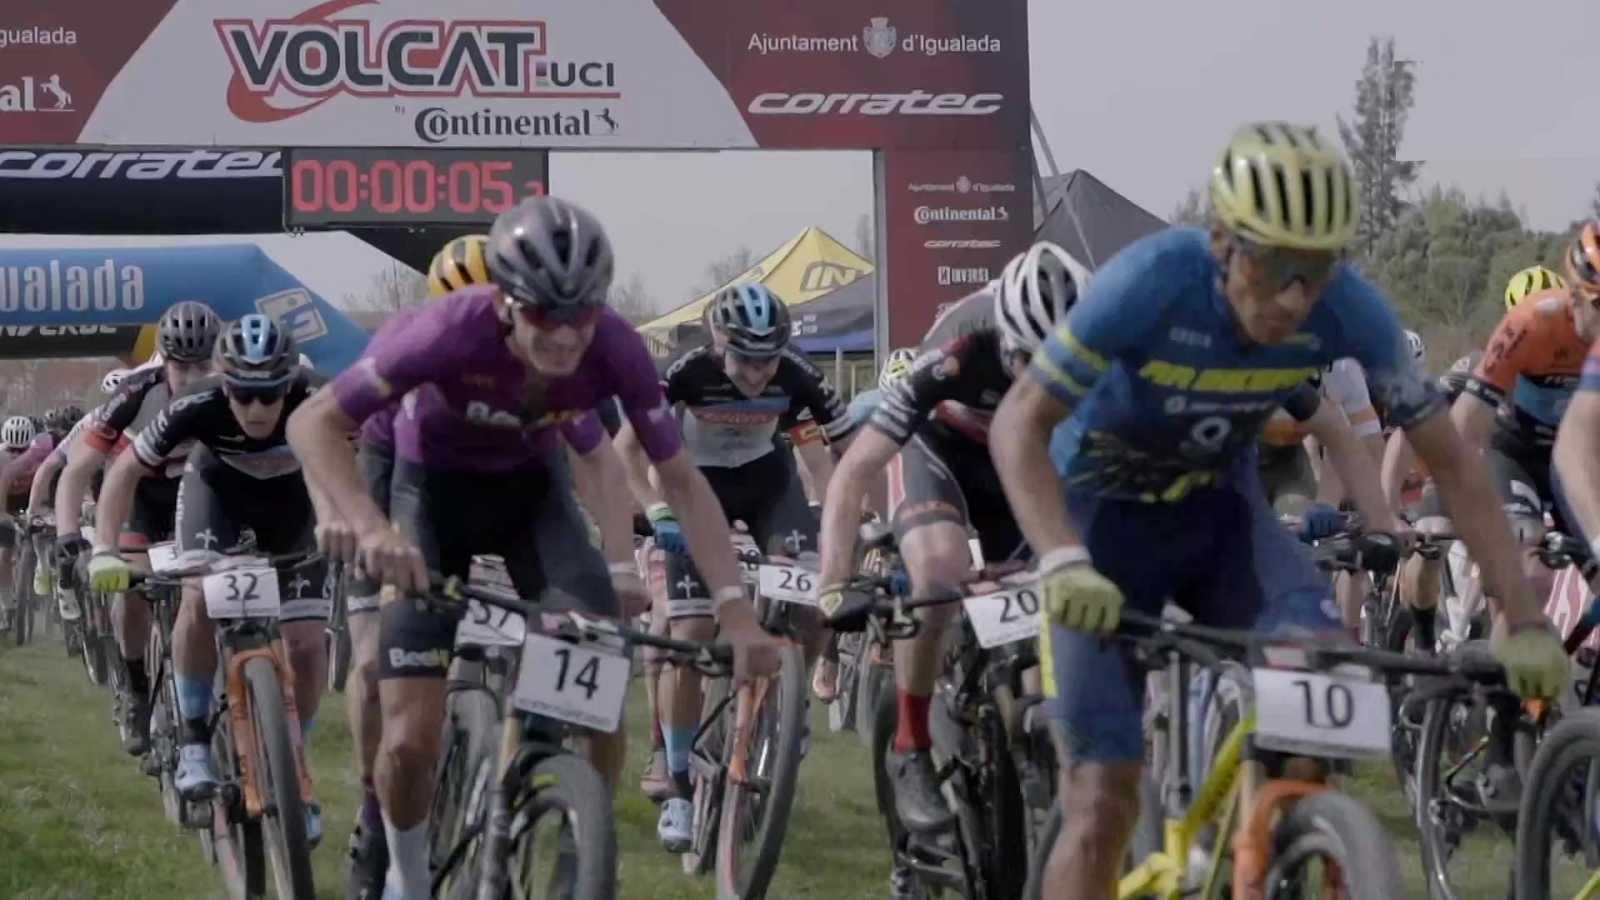 Mountain Bike - Volcat UCI 2021 - ver ahora